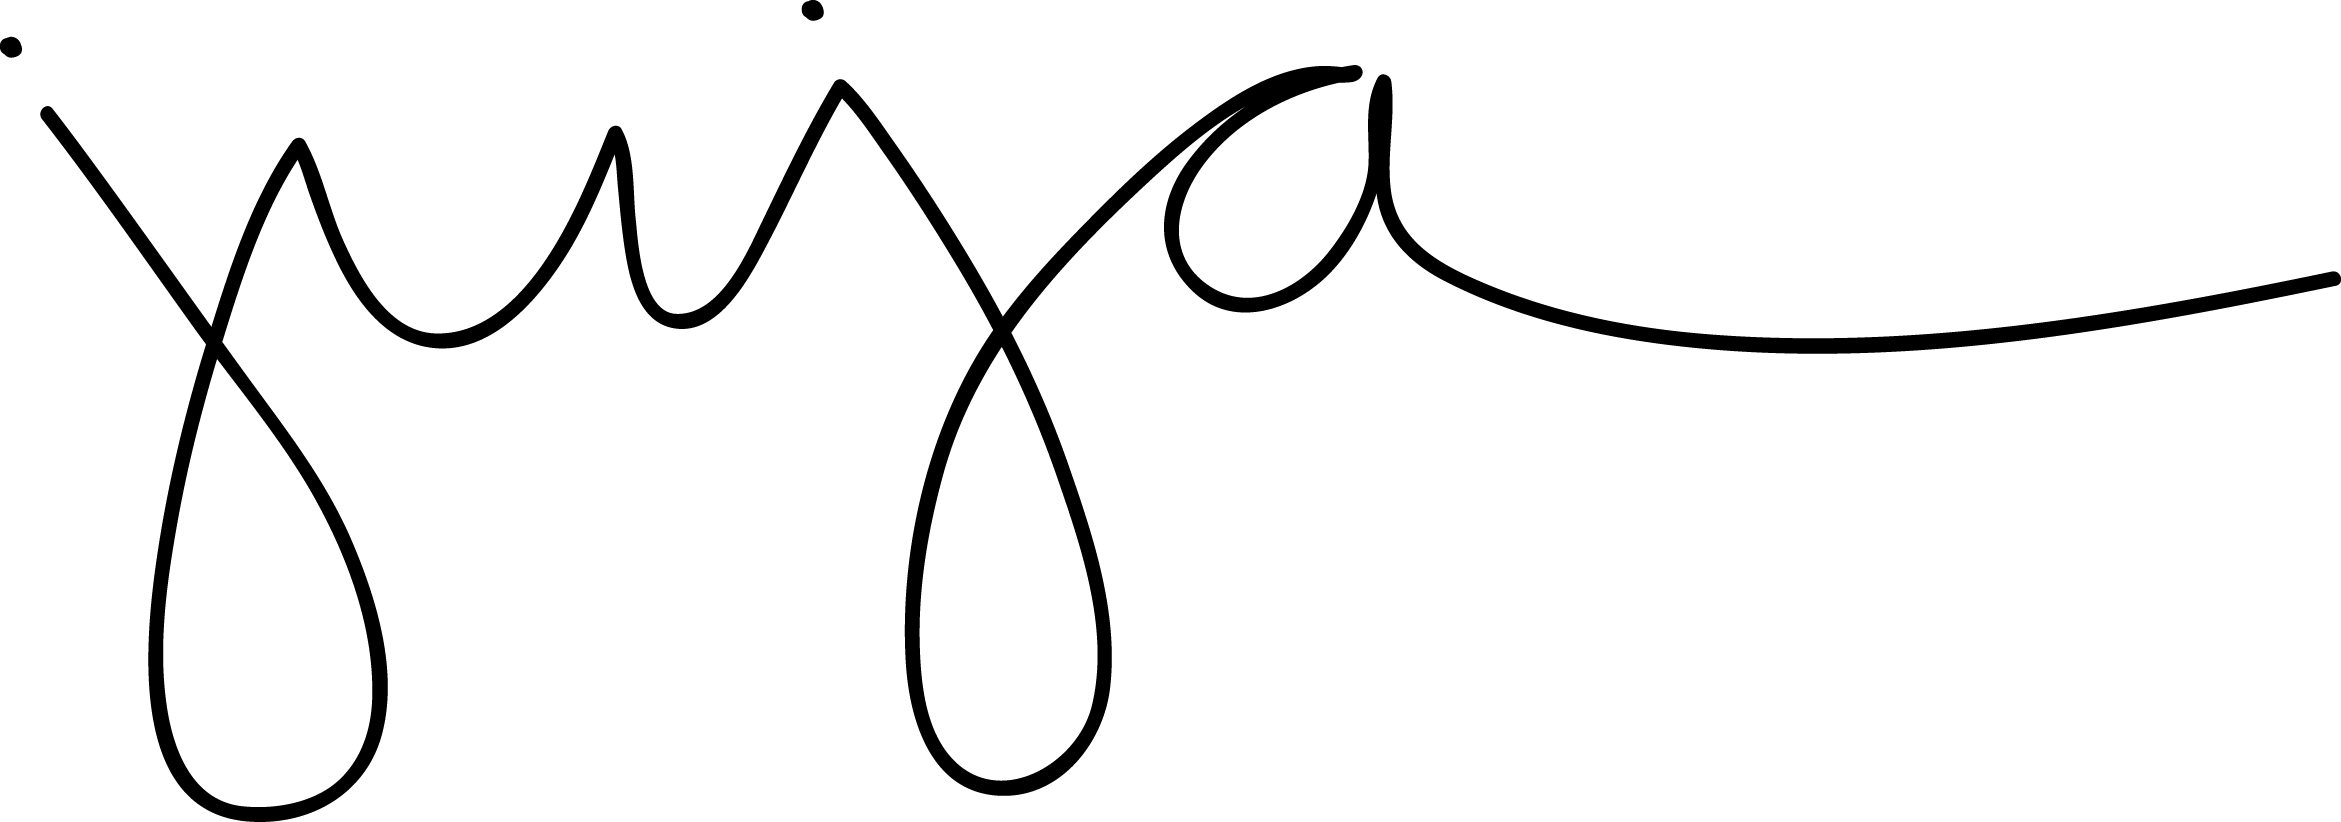 Julé CARRUTH's Signature